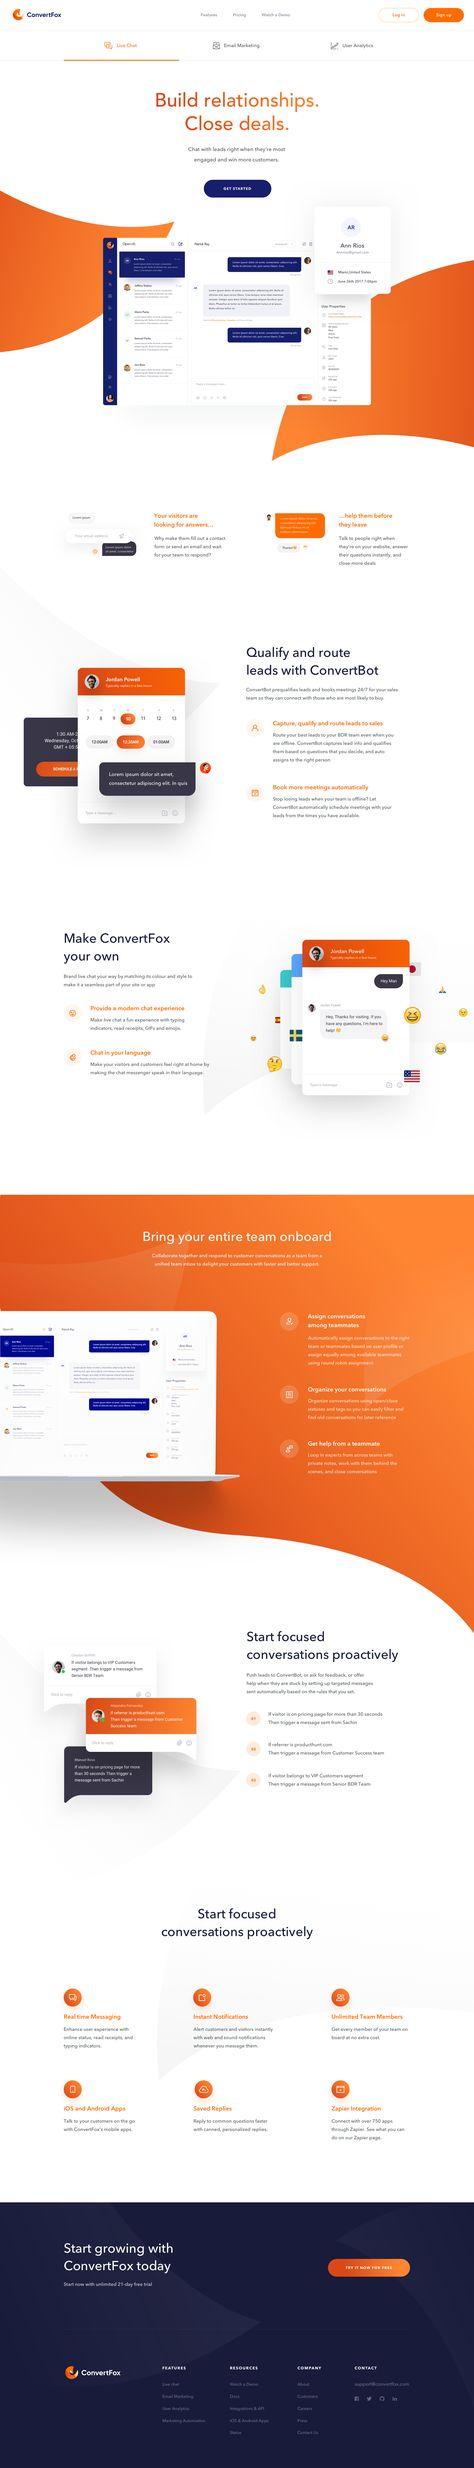 convertfox-website-live-chat.png by Martin Strba